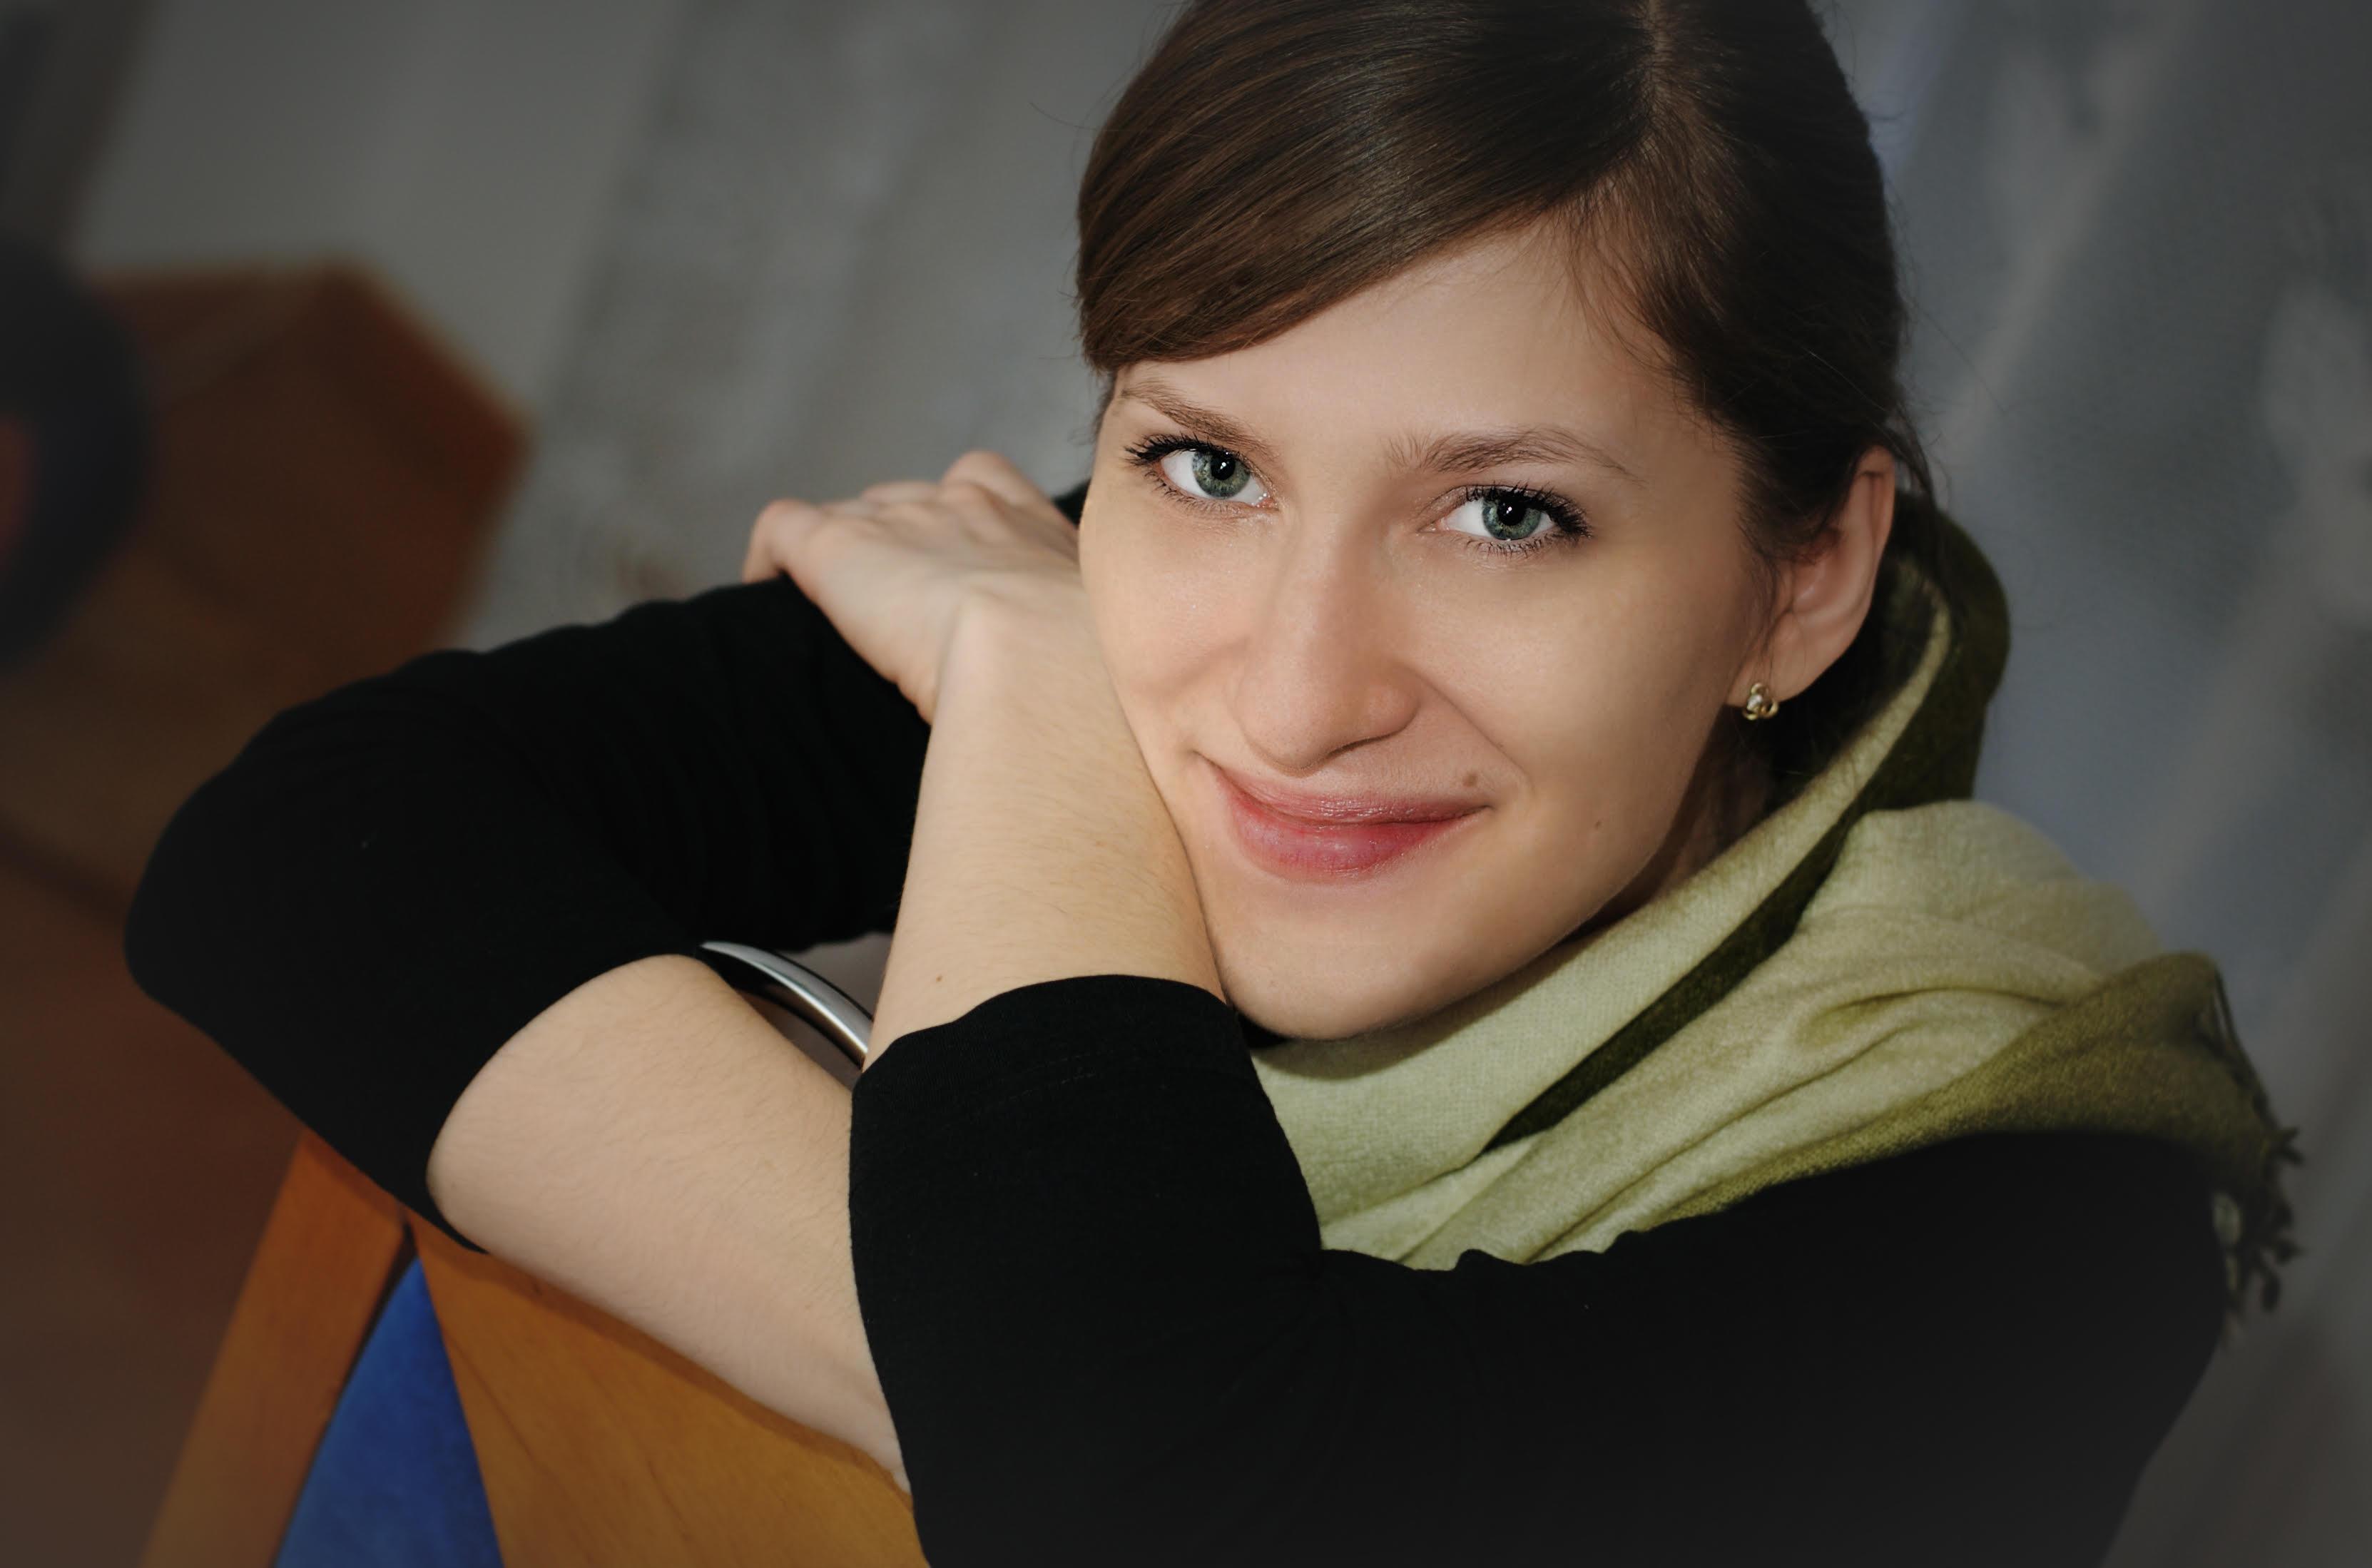 Izabela Knyżewska